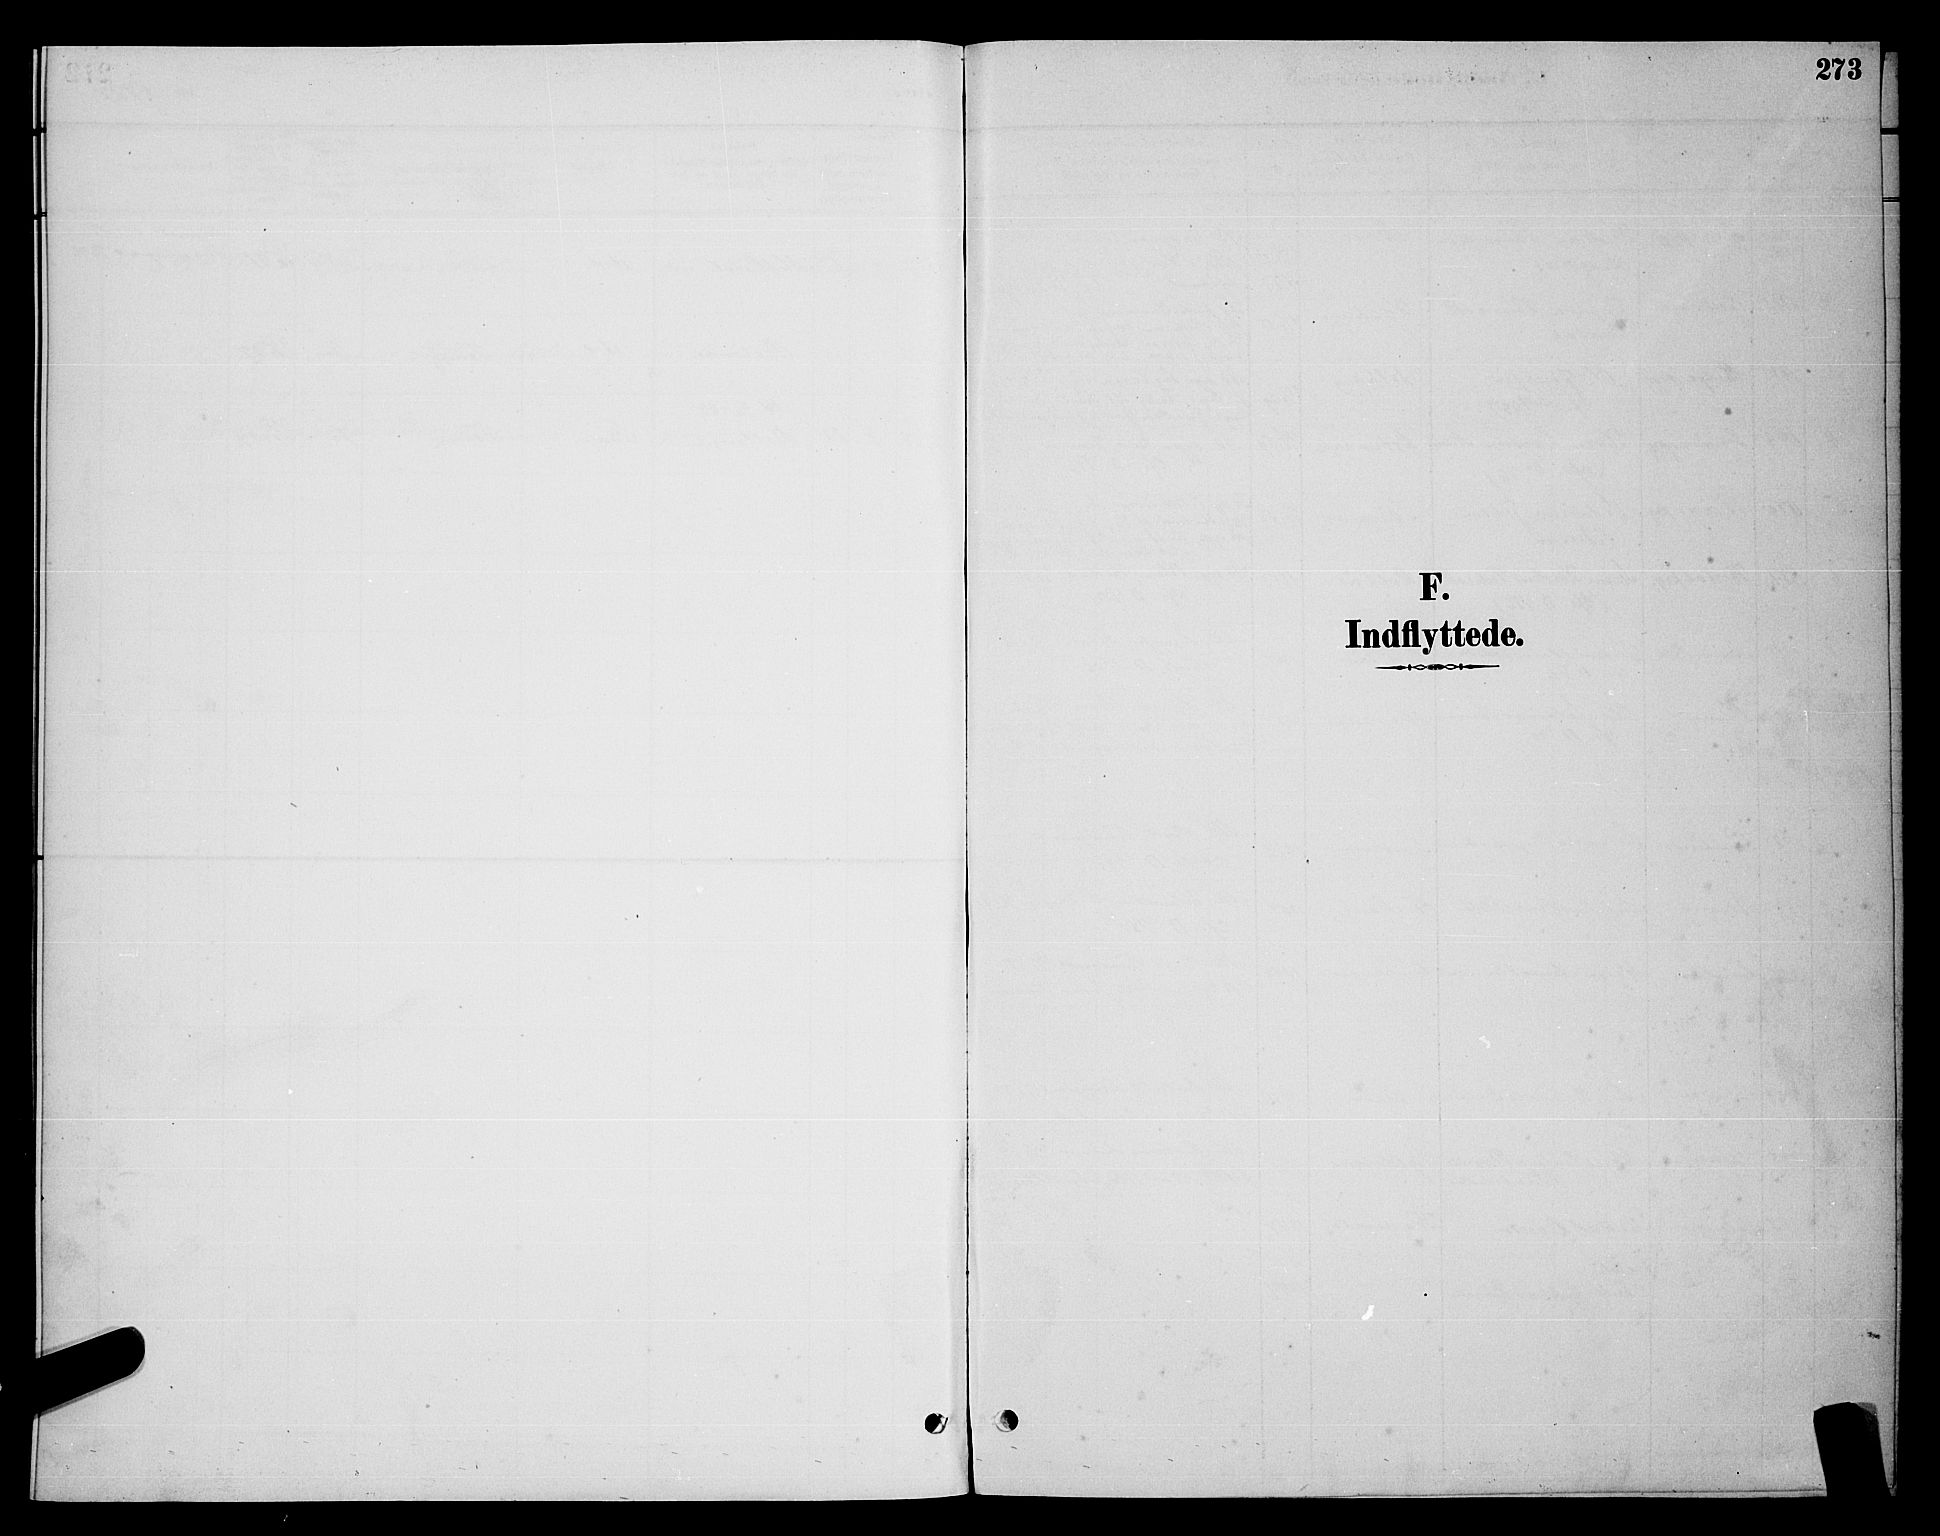 SAT, Ministerialprotokoller, klokkerbøker og fødselsregistre - Nordland, 863/L0914: Klokkerbok nr. 863C04, 1886-1897, s. 273